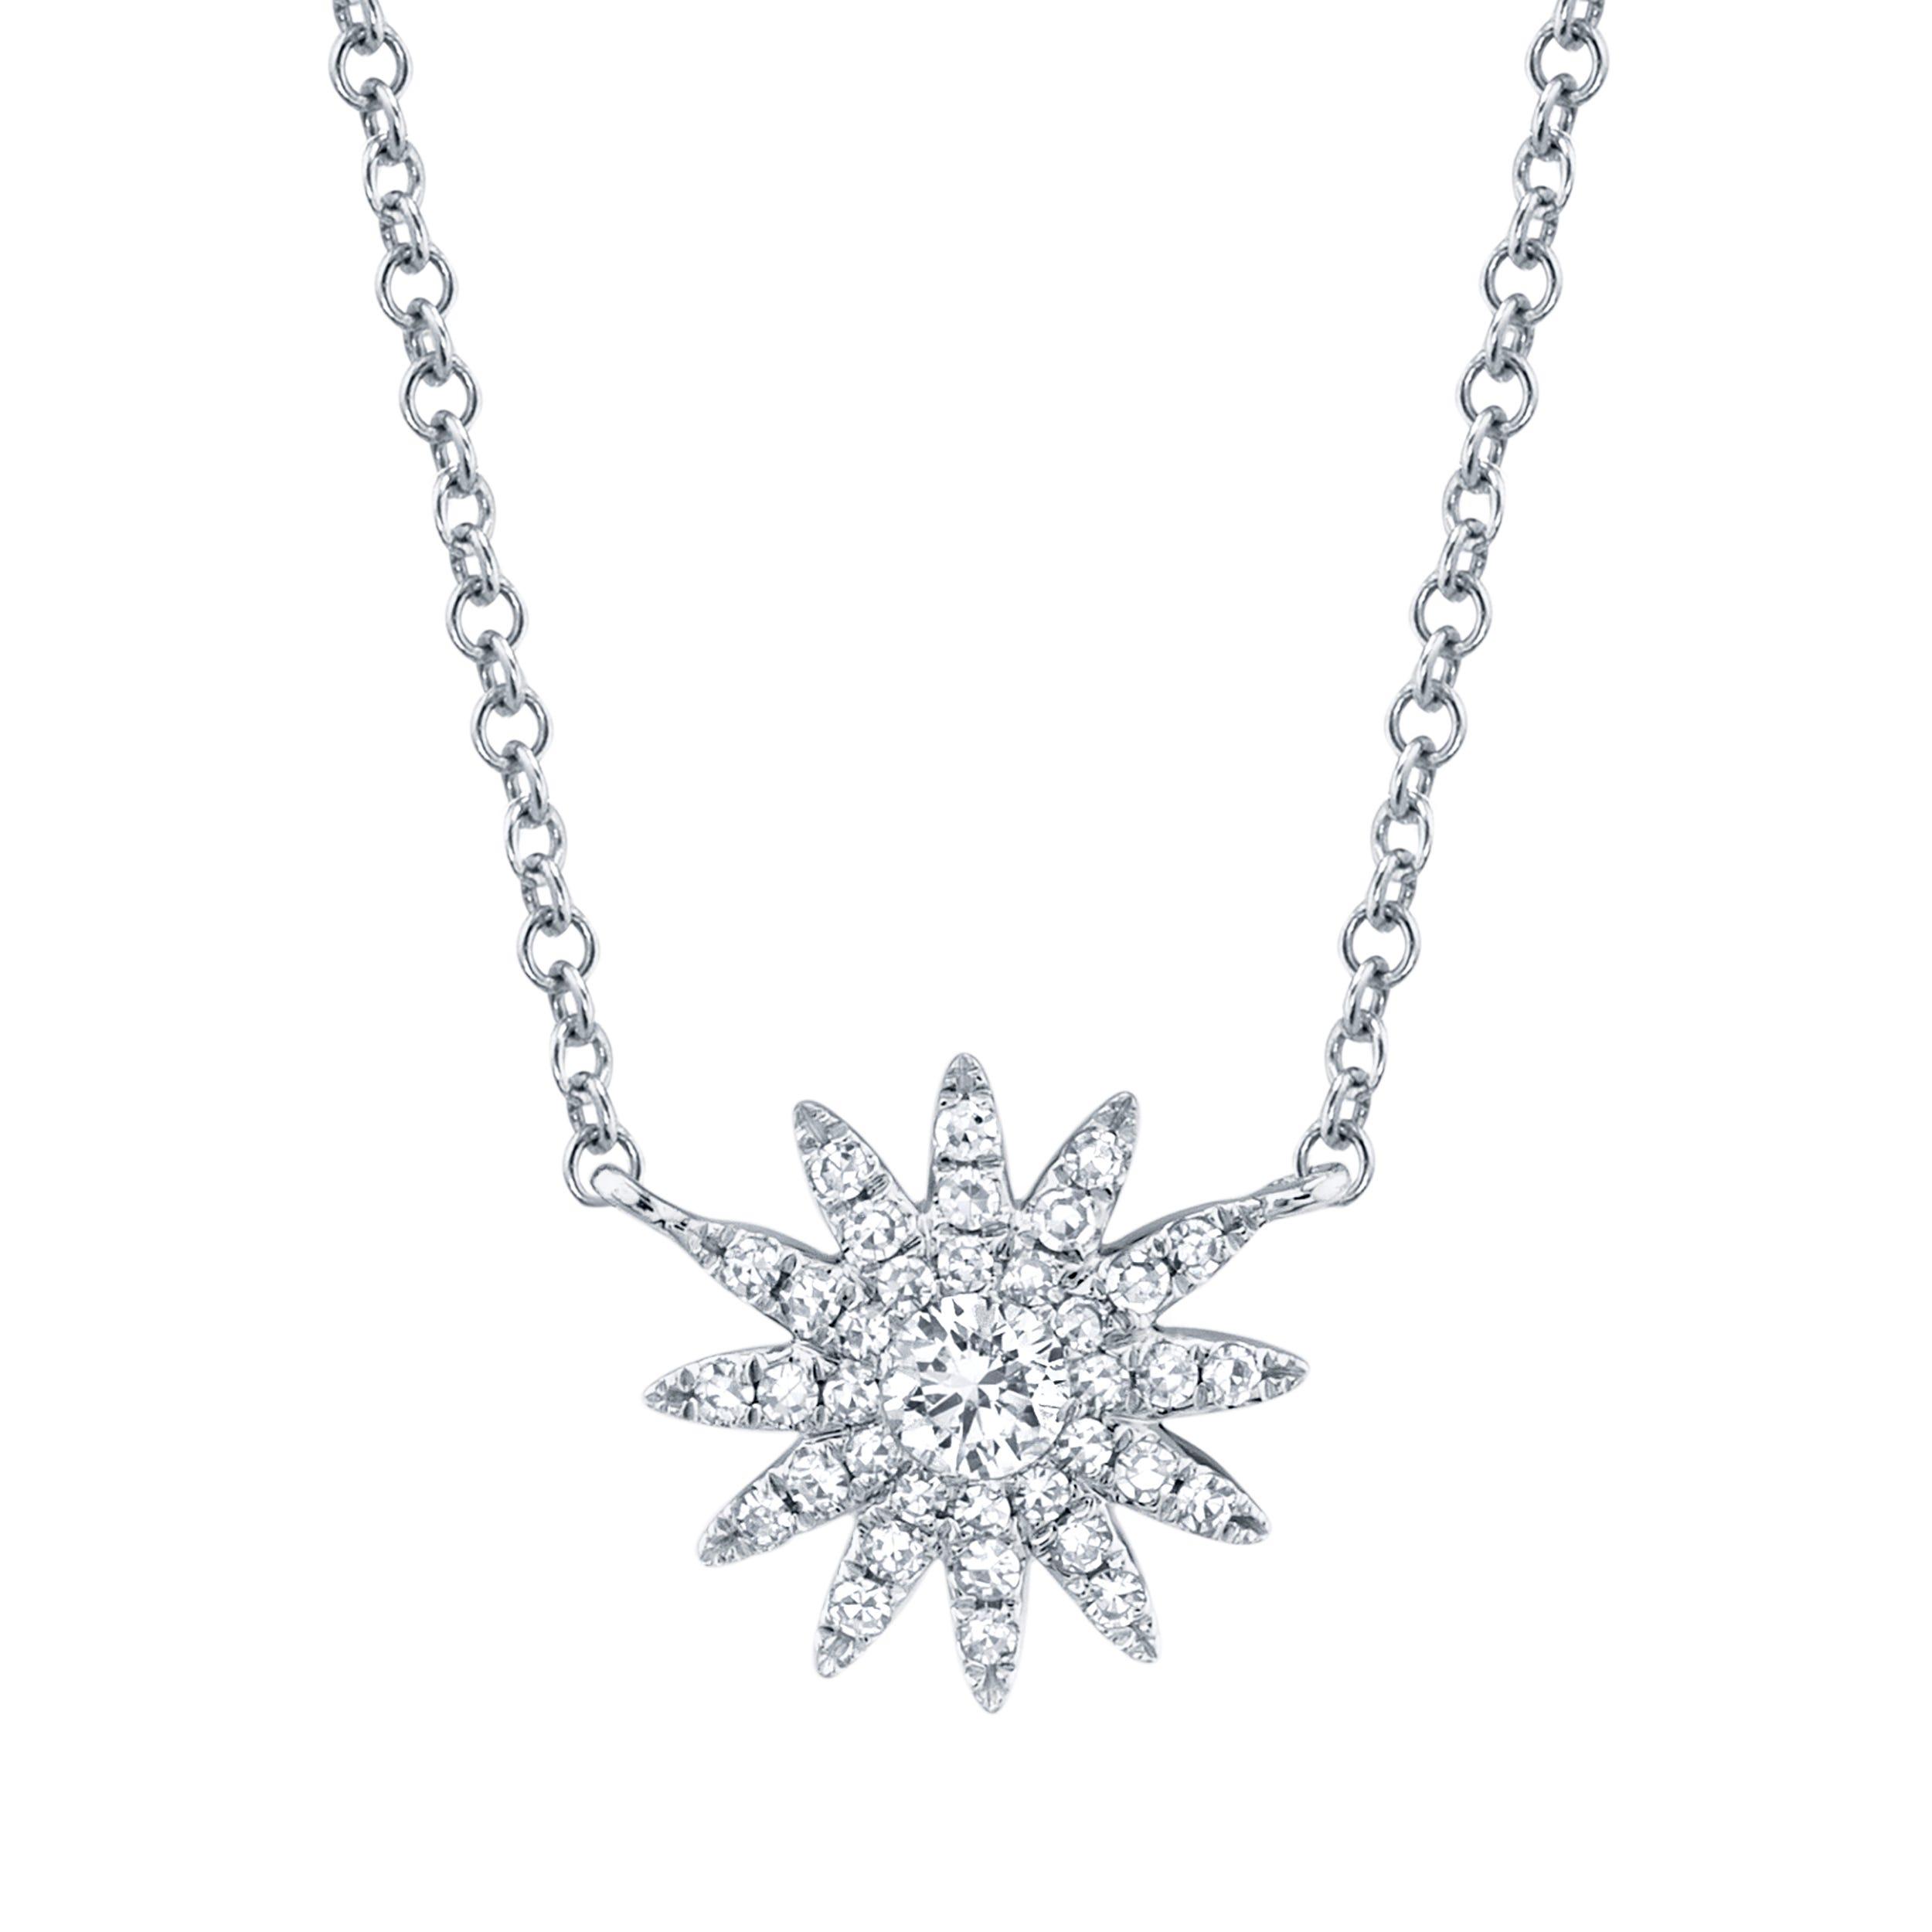 Shy Creation: Diamond Starburst Necklace in 14k White Gold